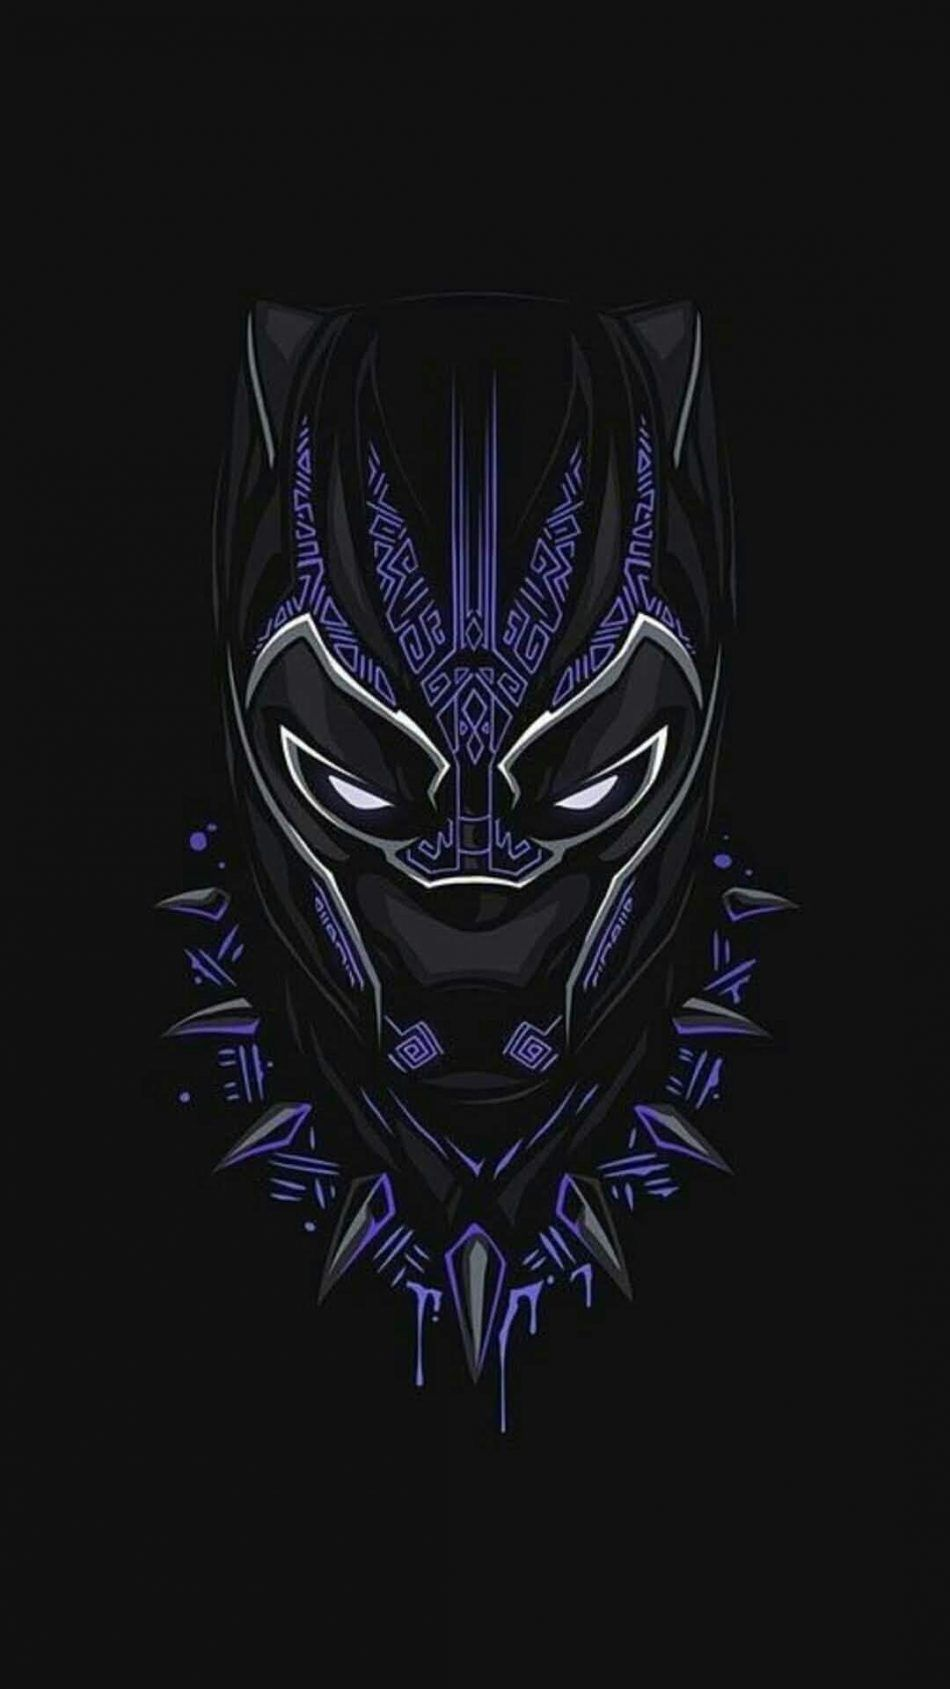 Film Review Black Panther Strange Harbors Black Panther Marvel Black Panther Hd Wallpaper Black Panther Tattoo